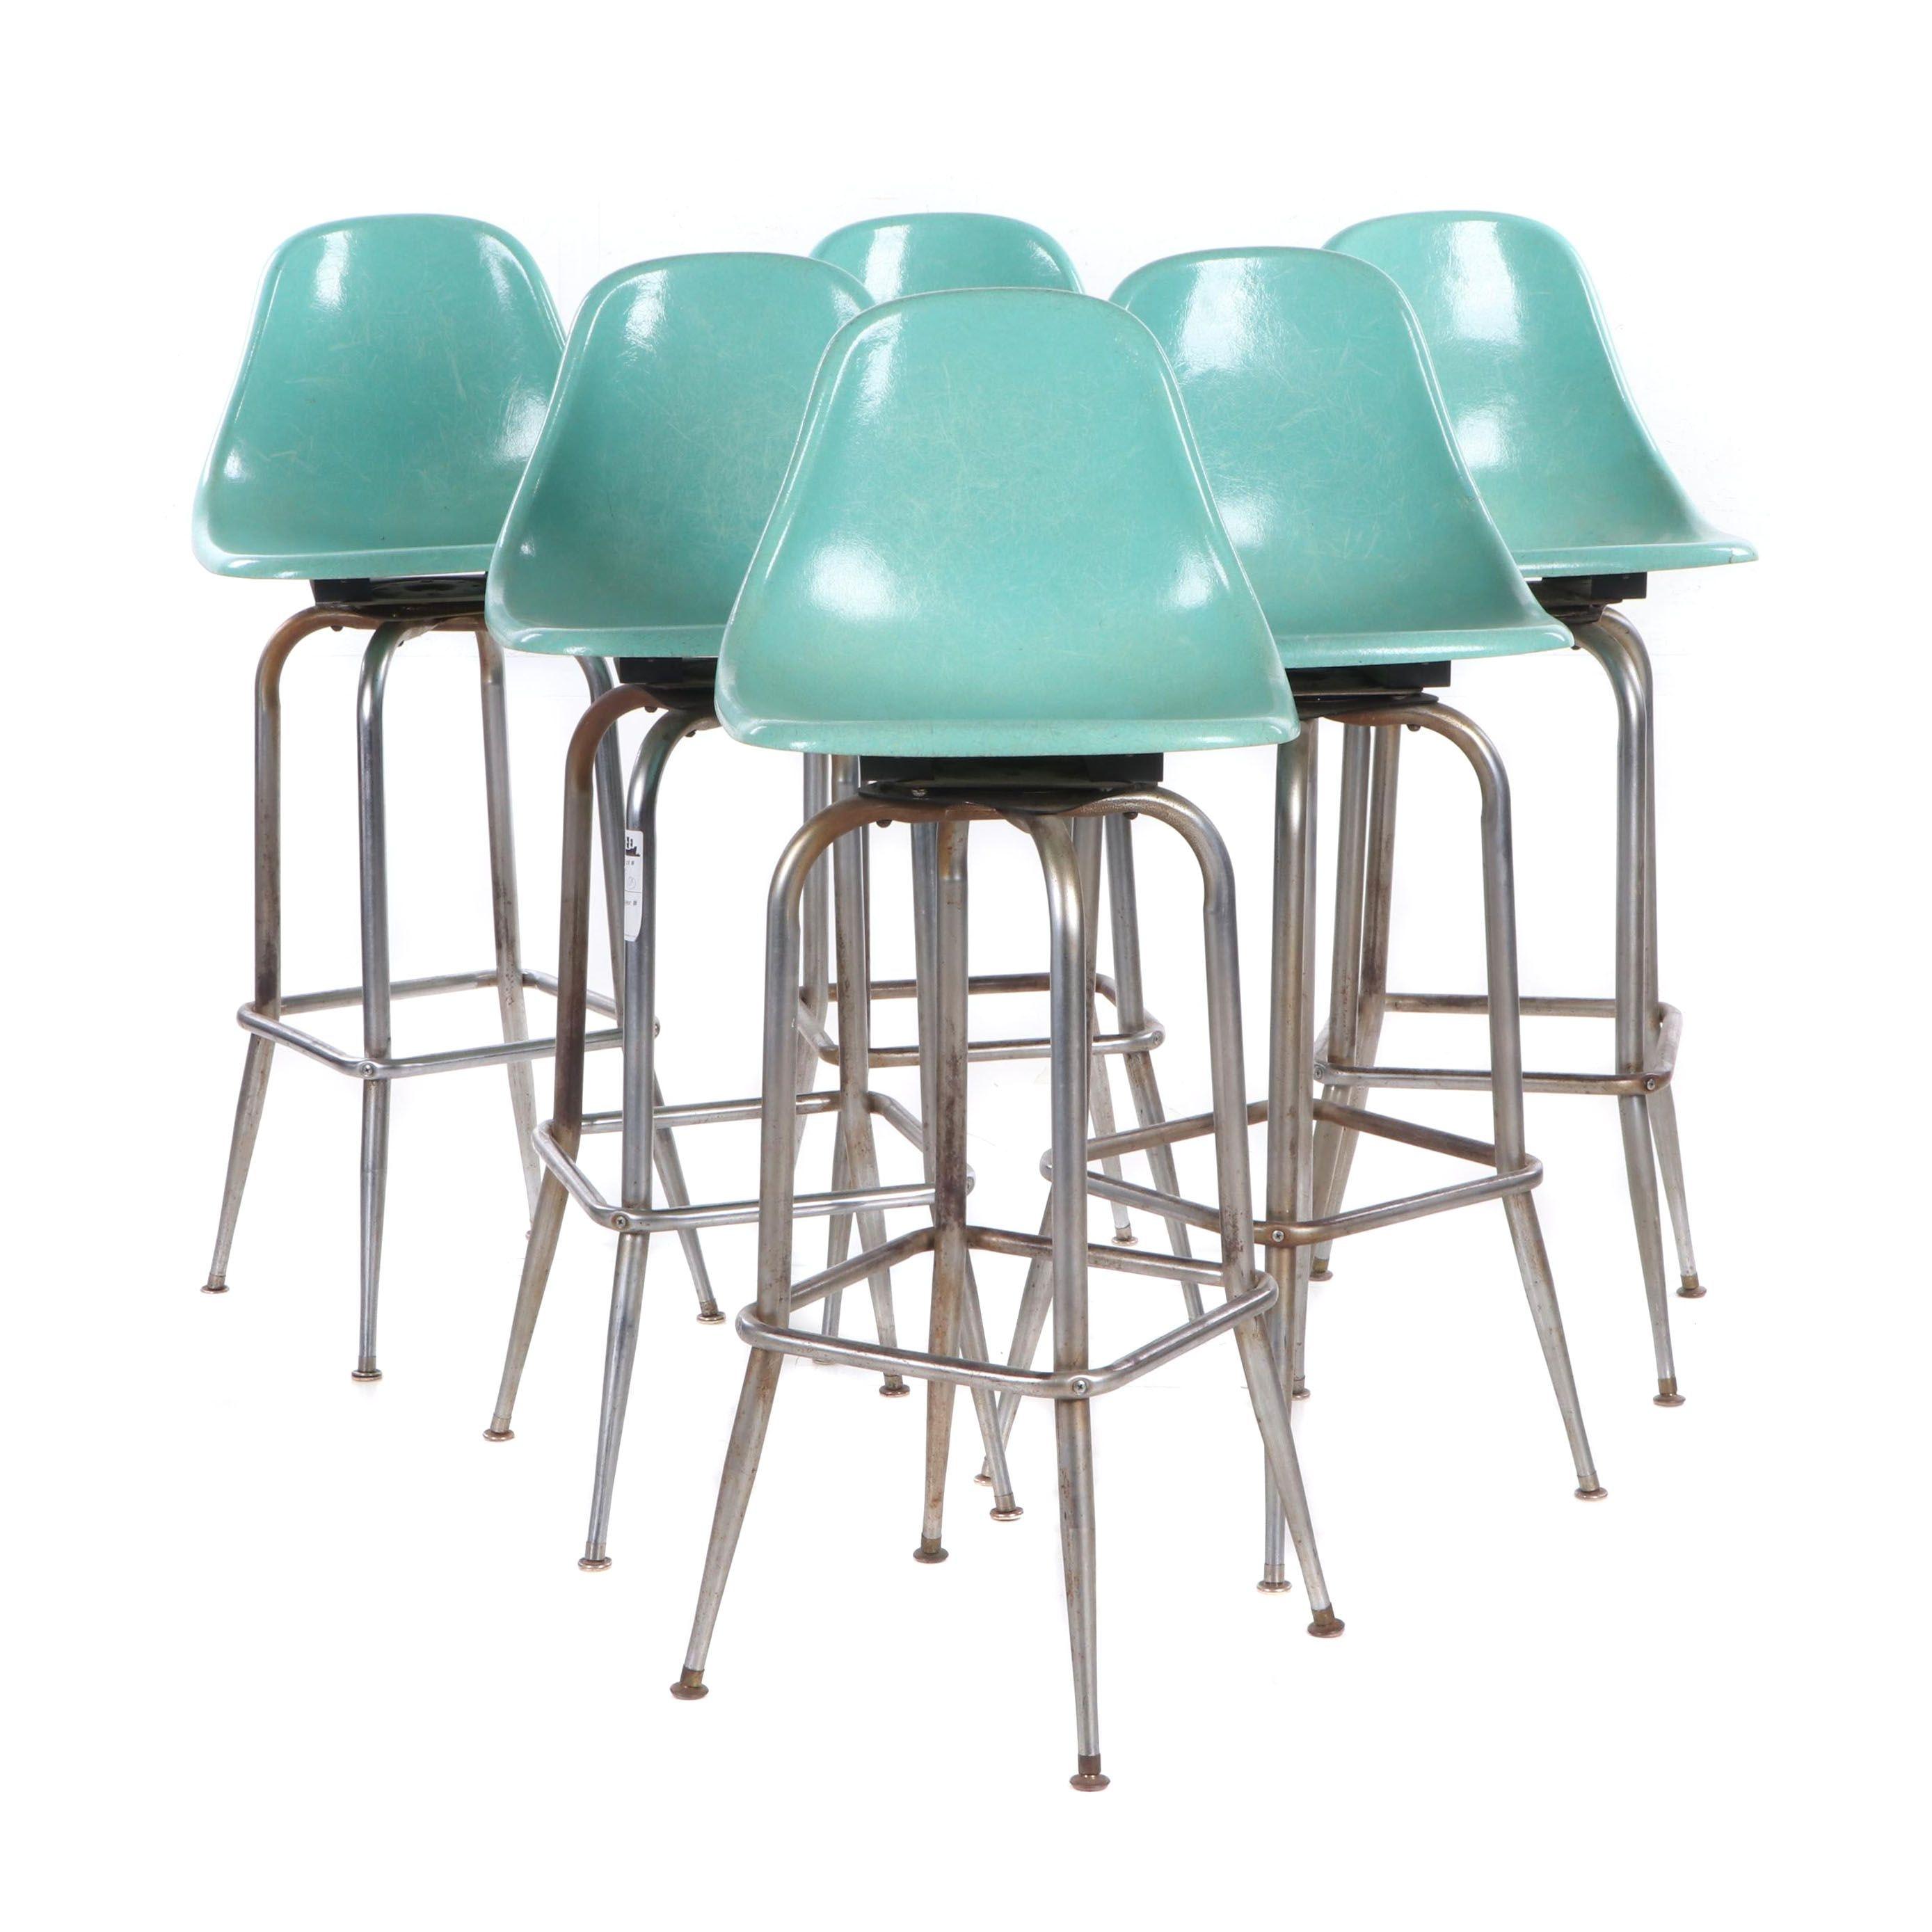 "Charles Eames Style Fiberglass ""Shell"" Swivel Counter Stools, Mid-20th Century"